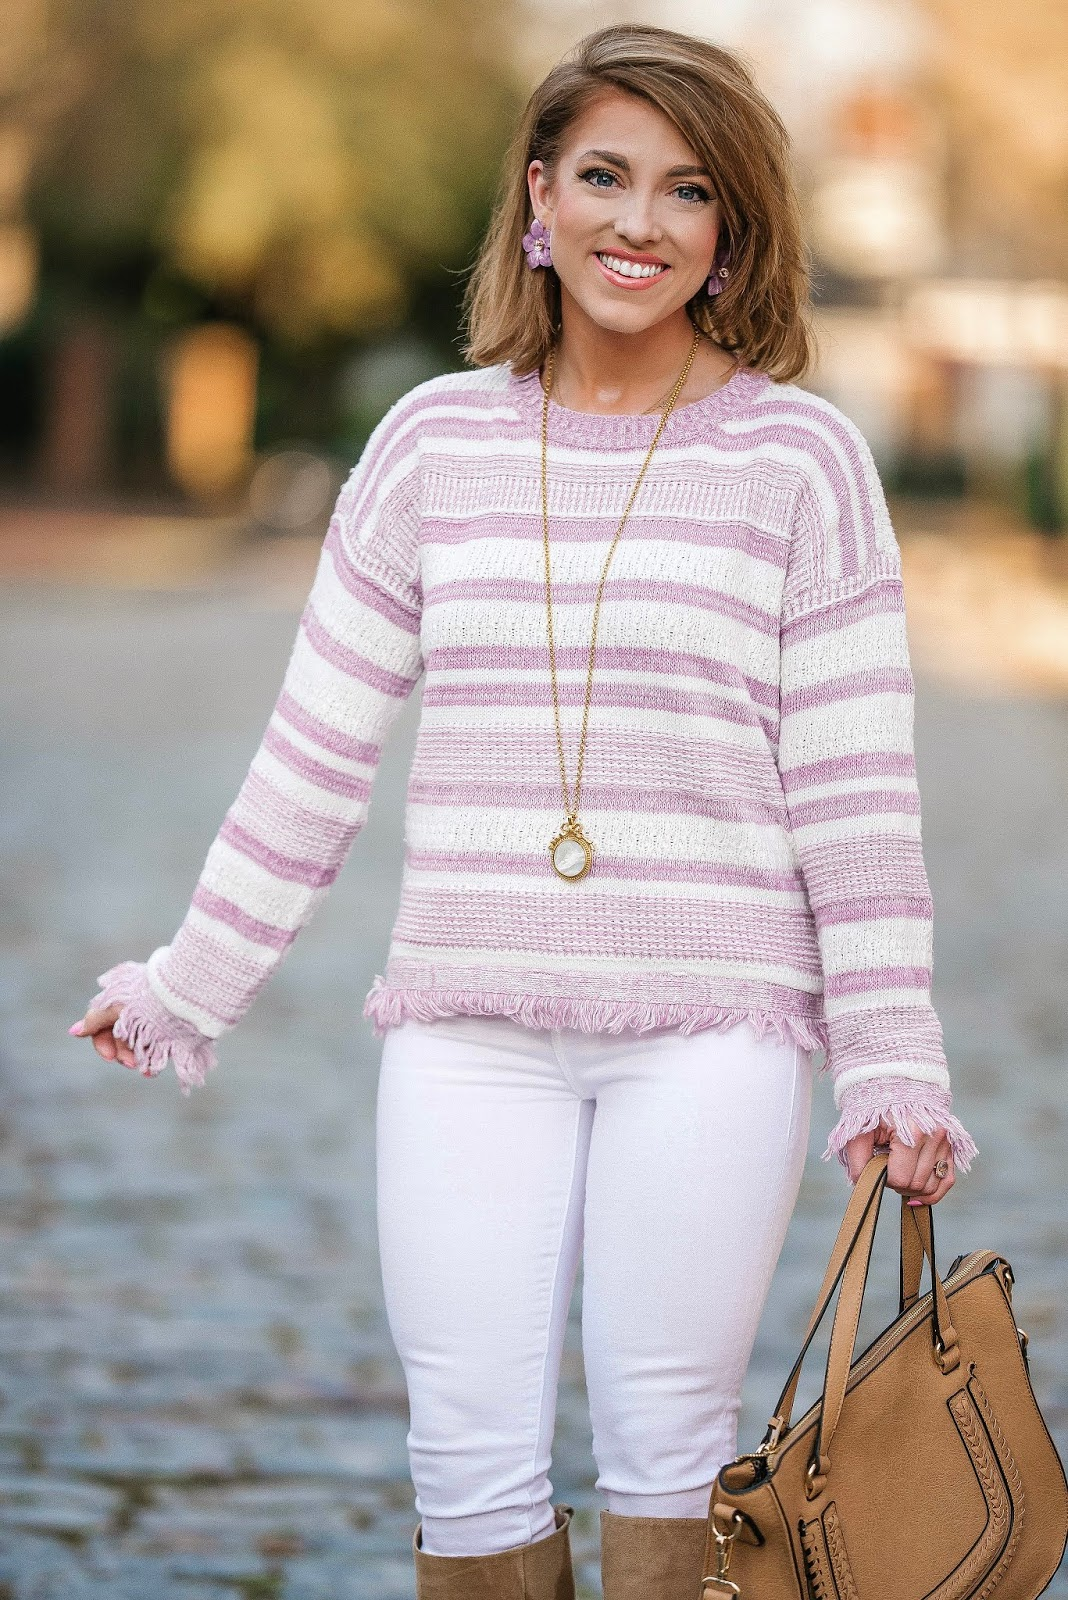 Lavender Love: Pre-Spring Look - Something Delightful Blog